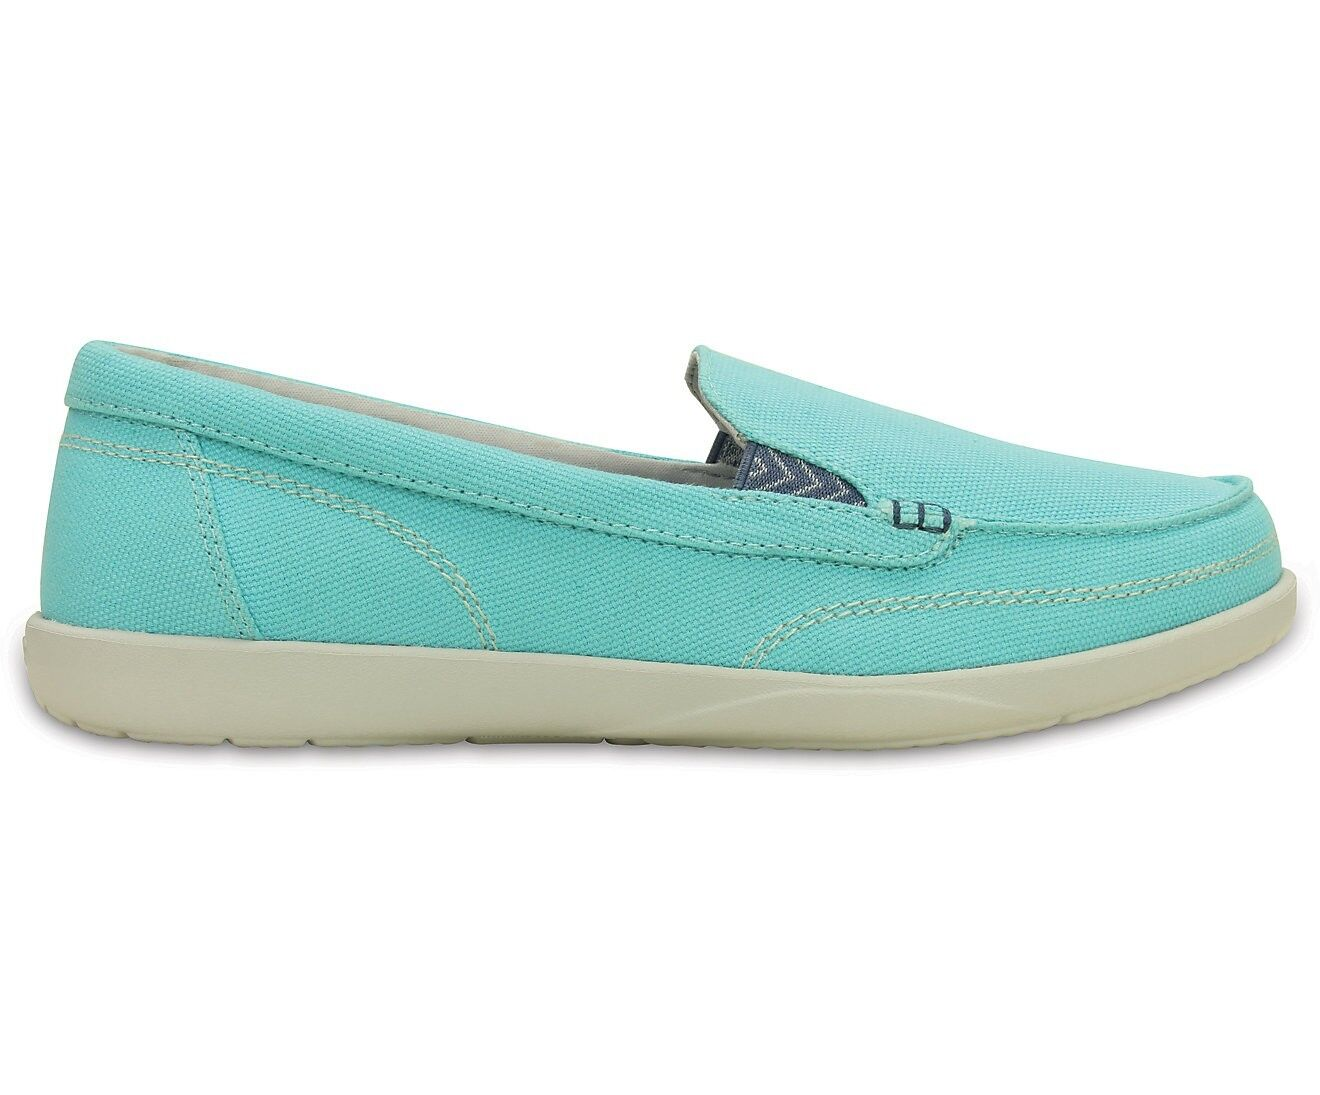 Crocs Walu II Canvas Loafer Ice Blau/Pearl WEISS